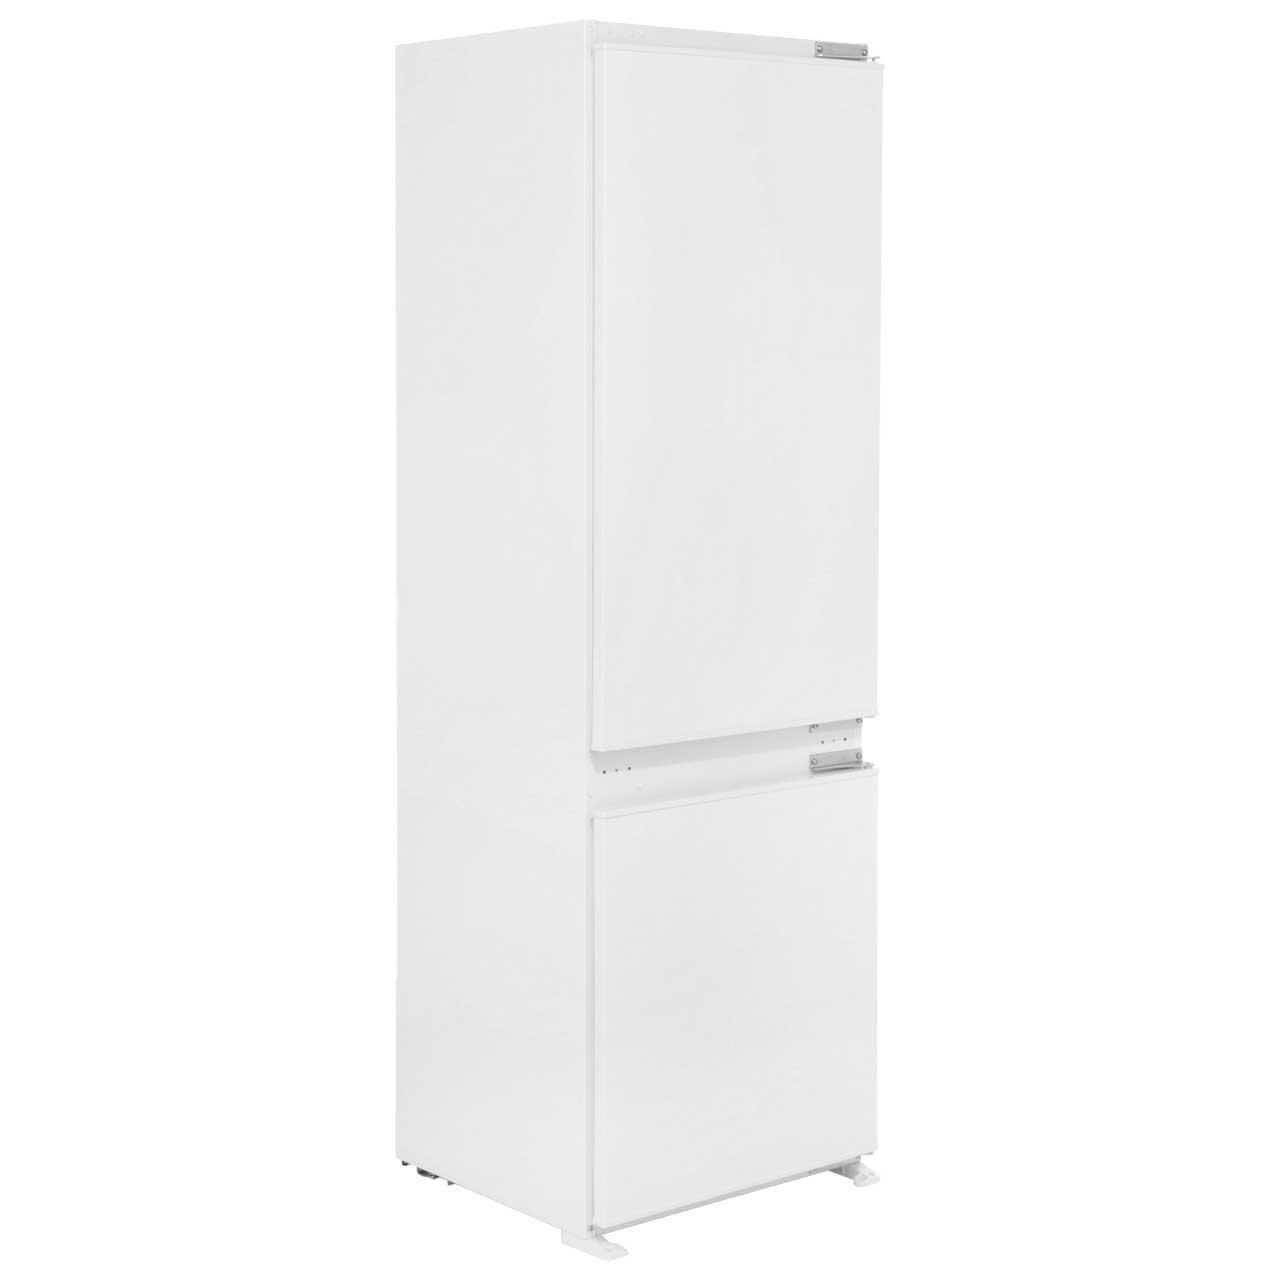 Beko BC732 Integrated Fridge Freezer in White